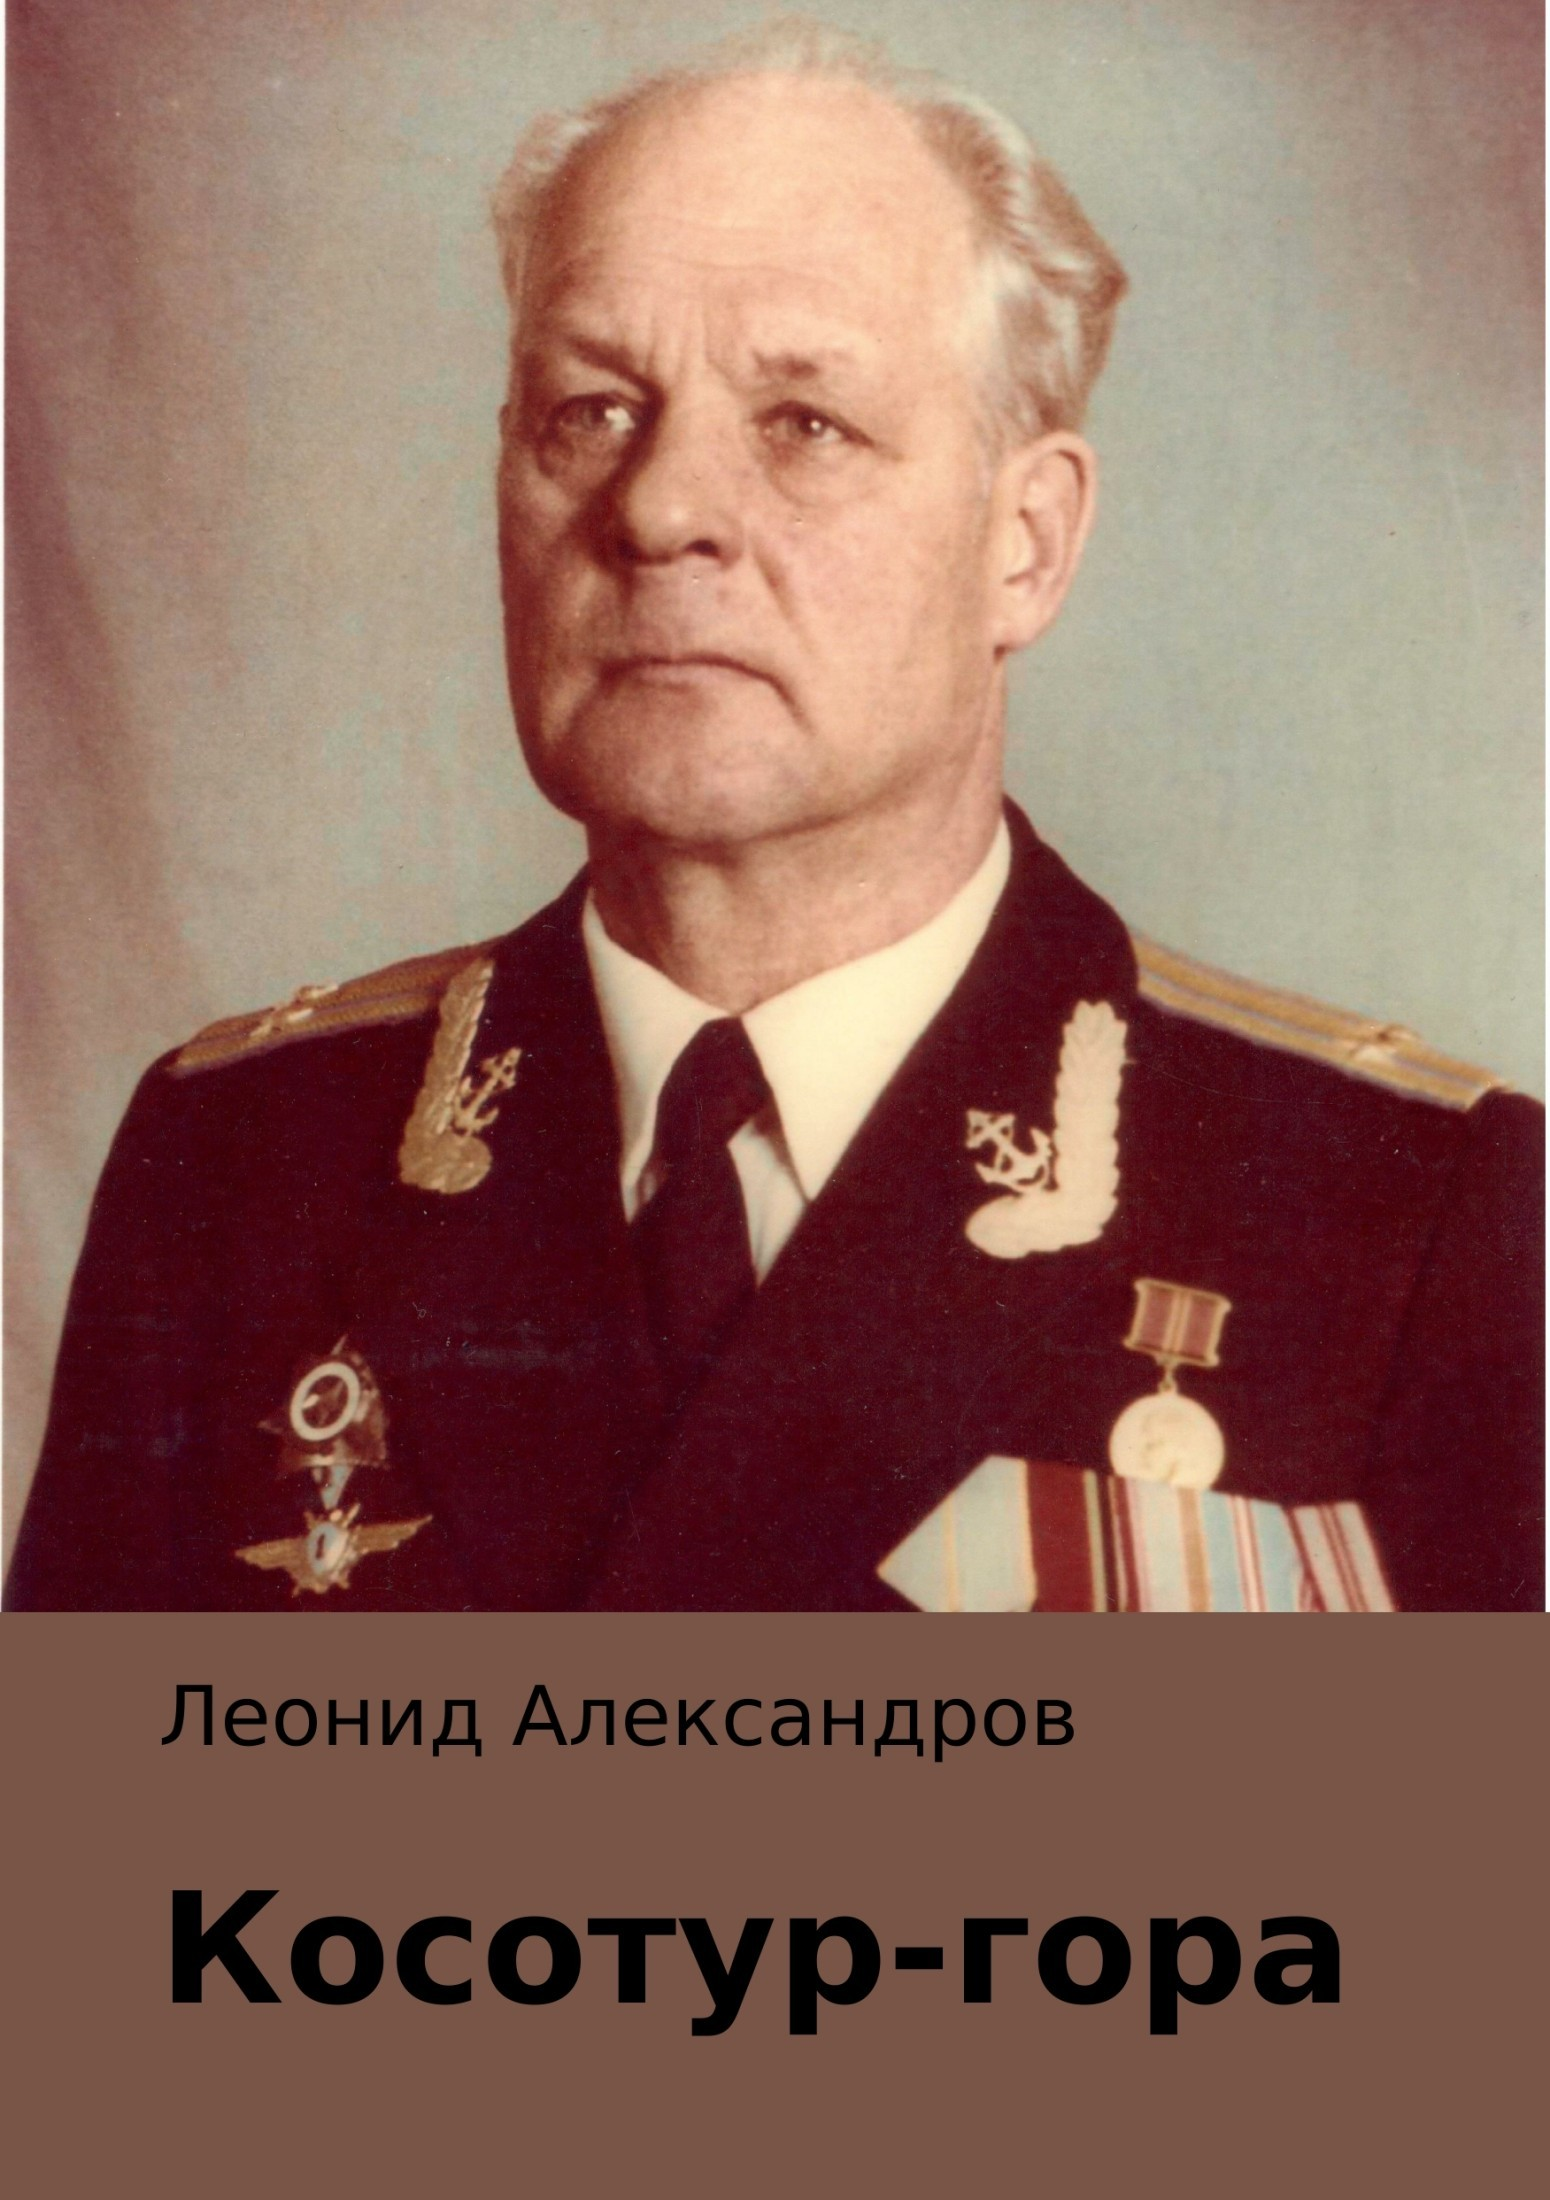 Леонид Александров Косотур-гора